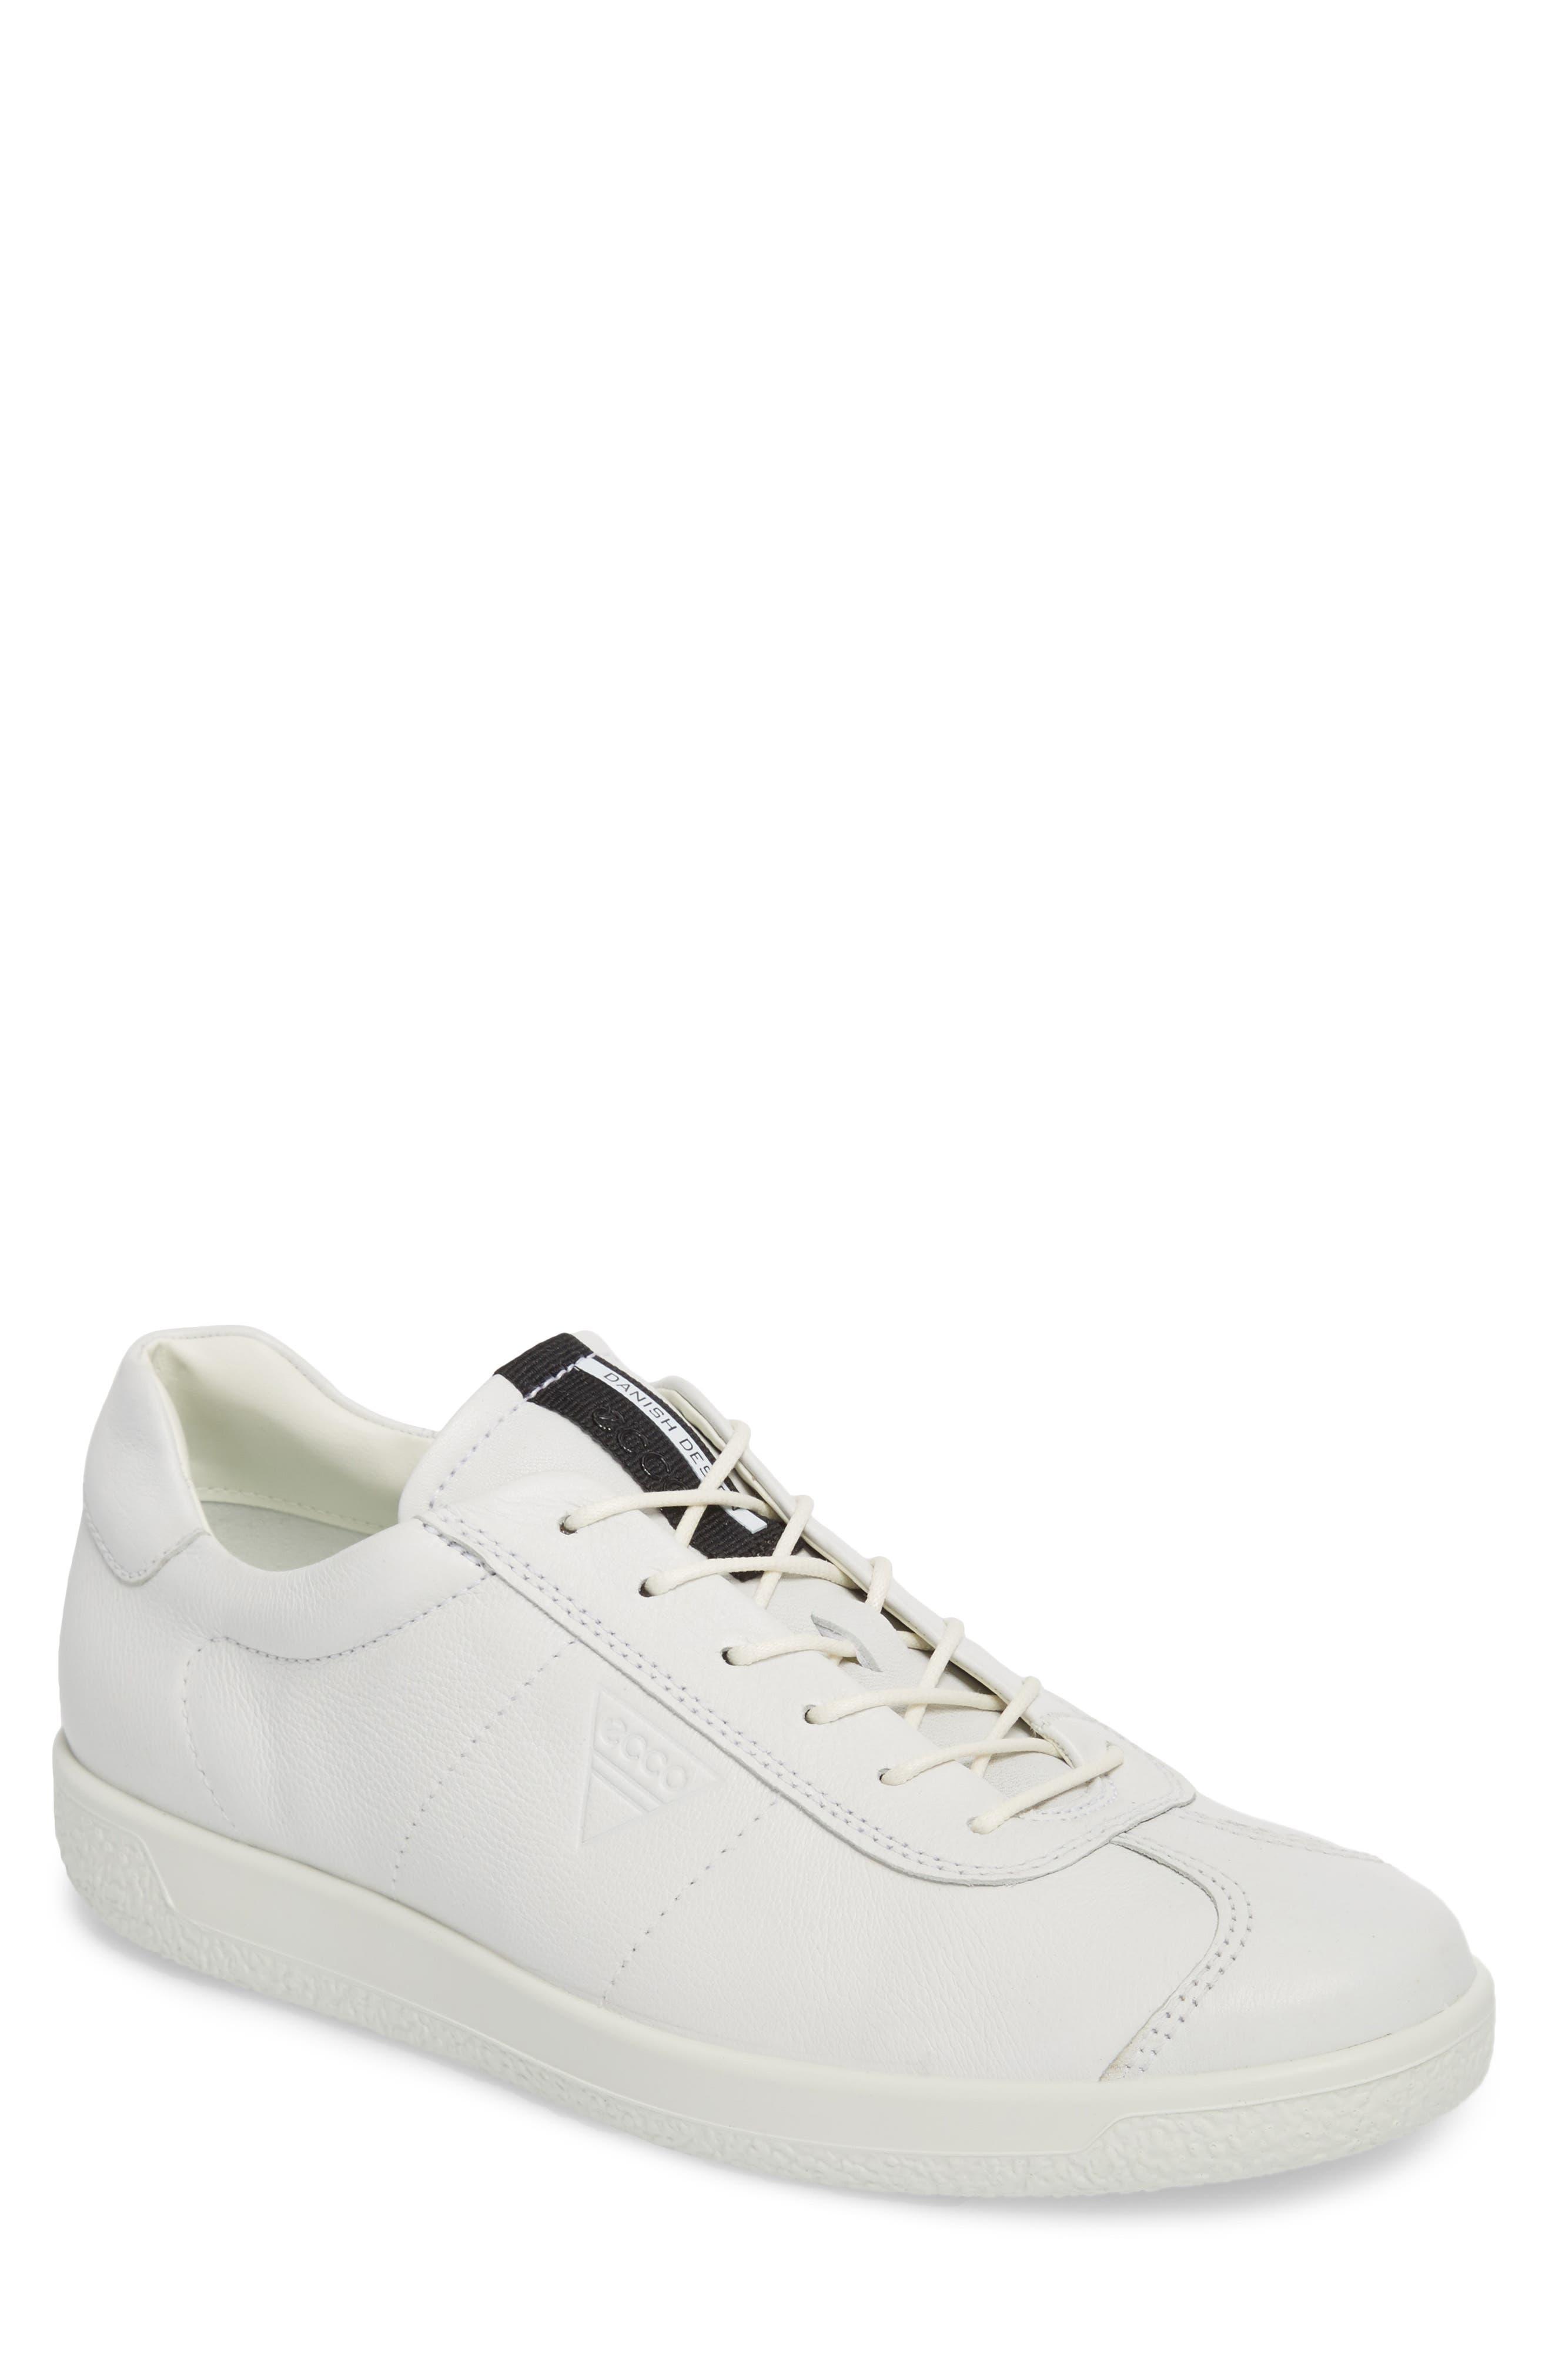 ECCO Soft 1 Sneaker (Men)